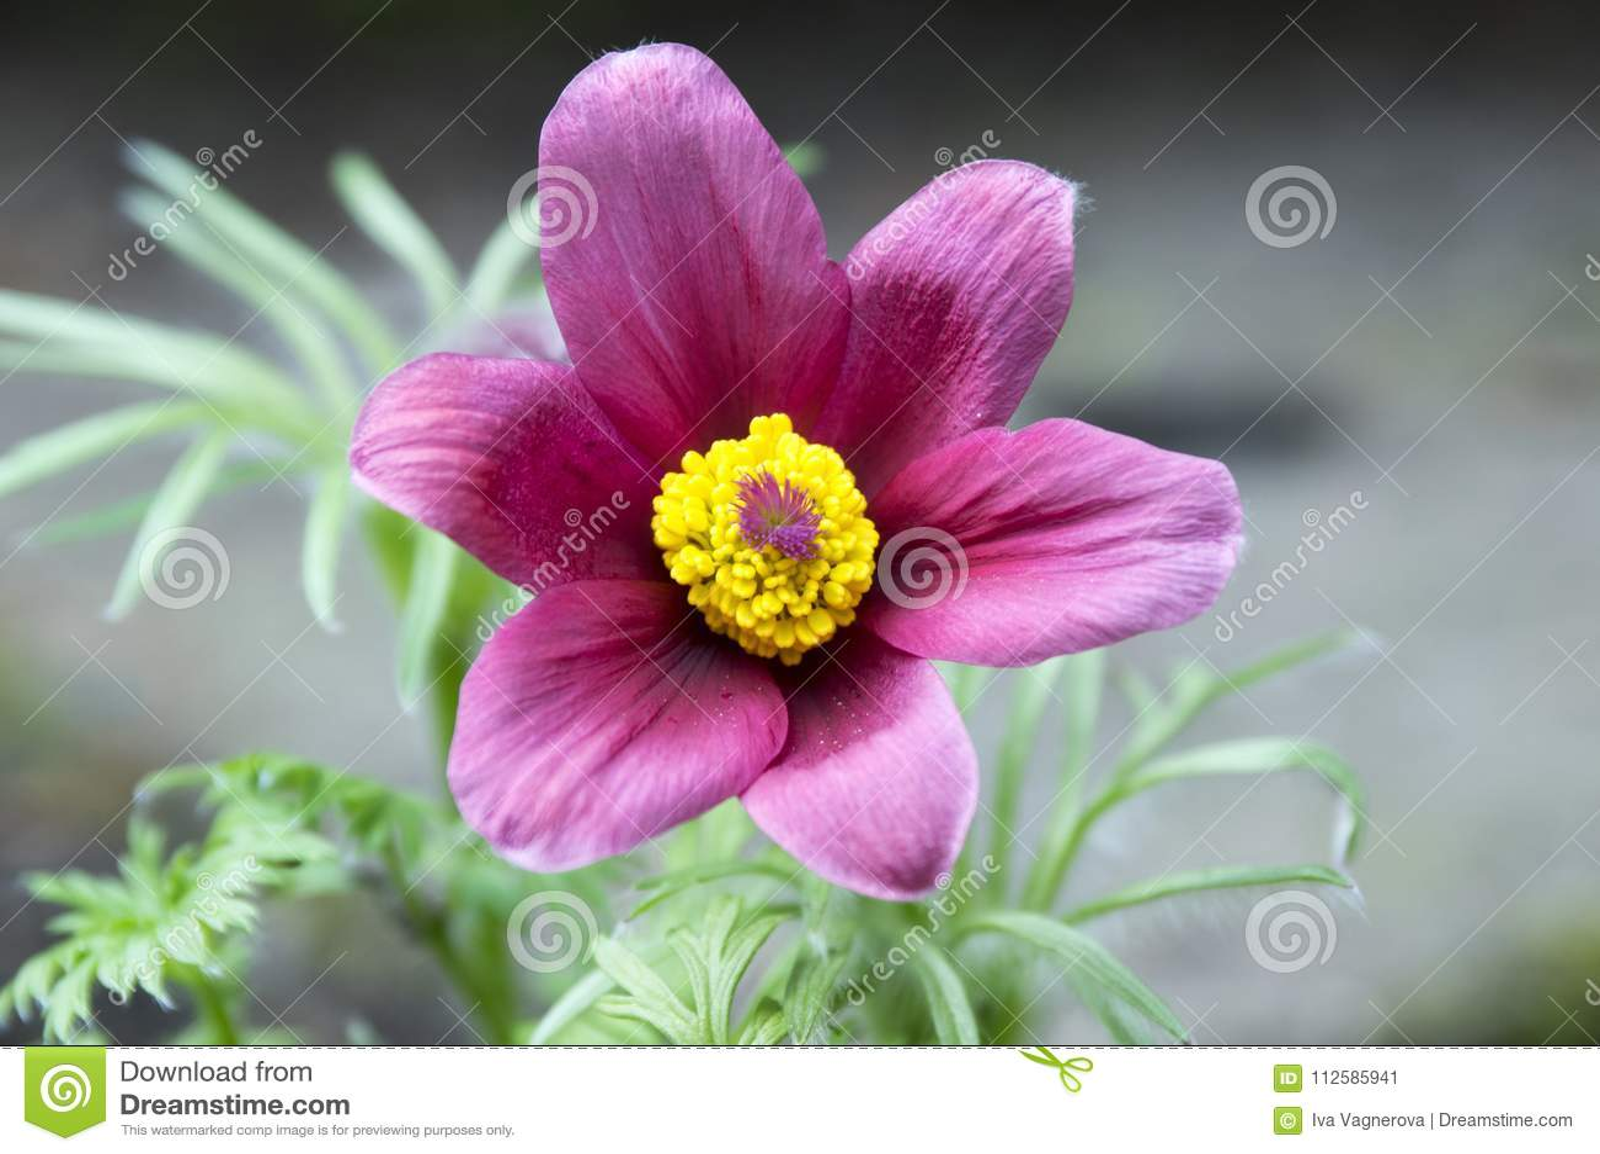 Pulsatilla Vulgaris Springtime Pink Purple Flower With Yellow